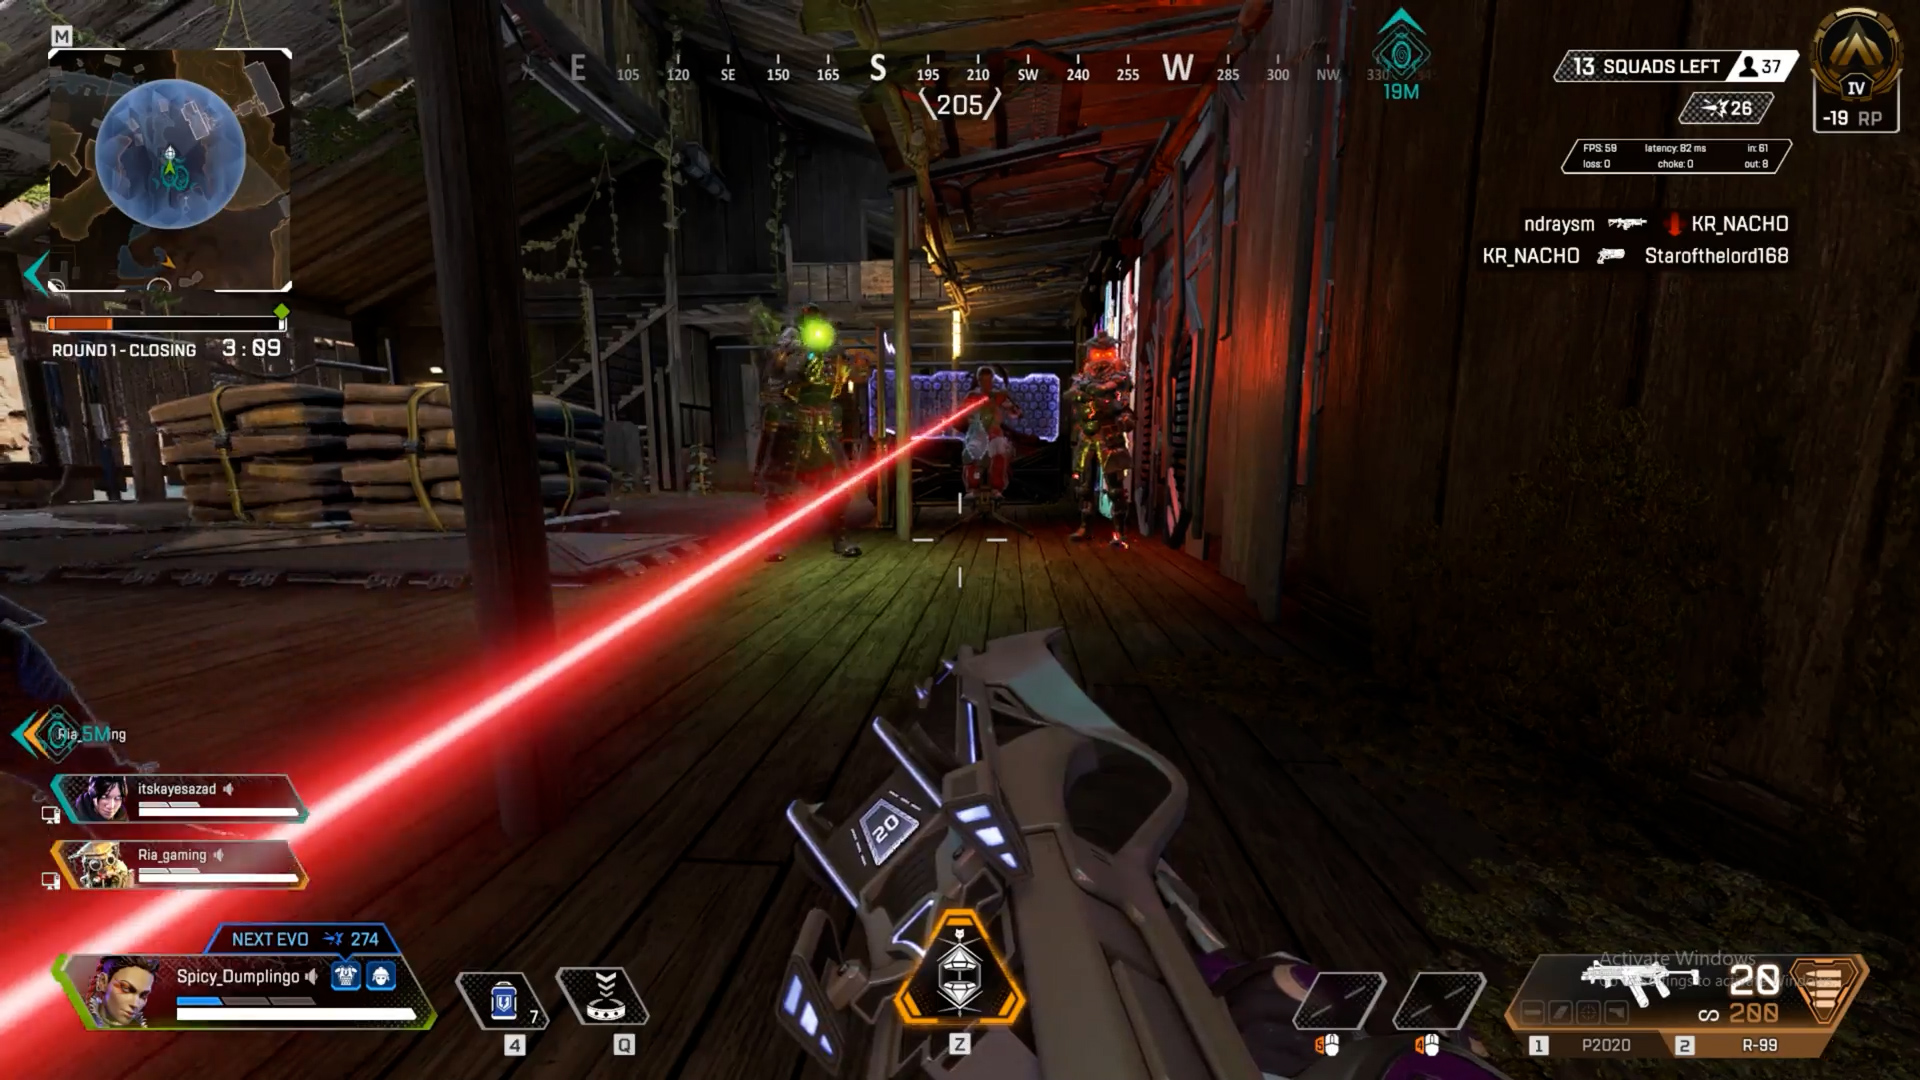 【APEX】逃げポータルを使って駆け込んだ建物に敵部隊3人が待ち構えていた時